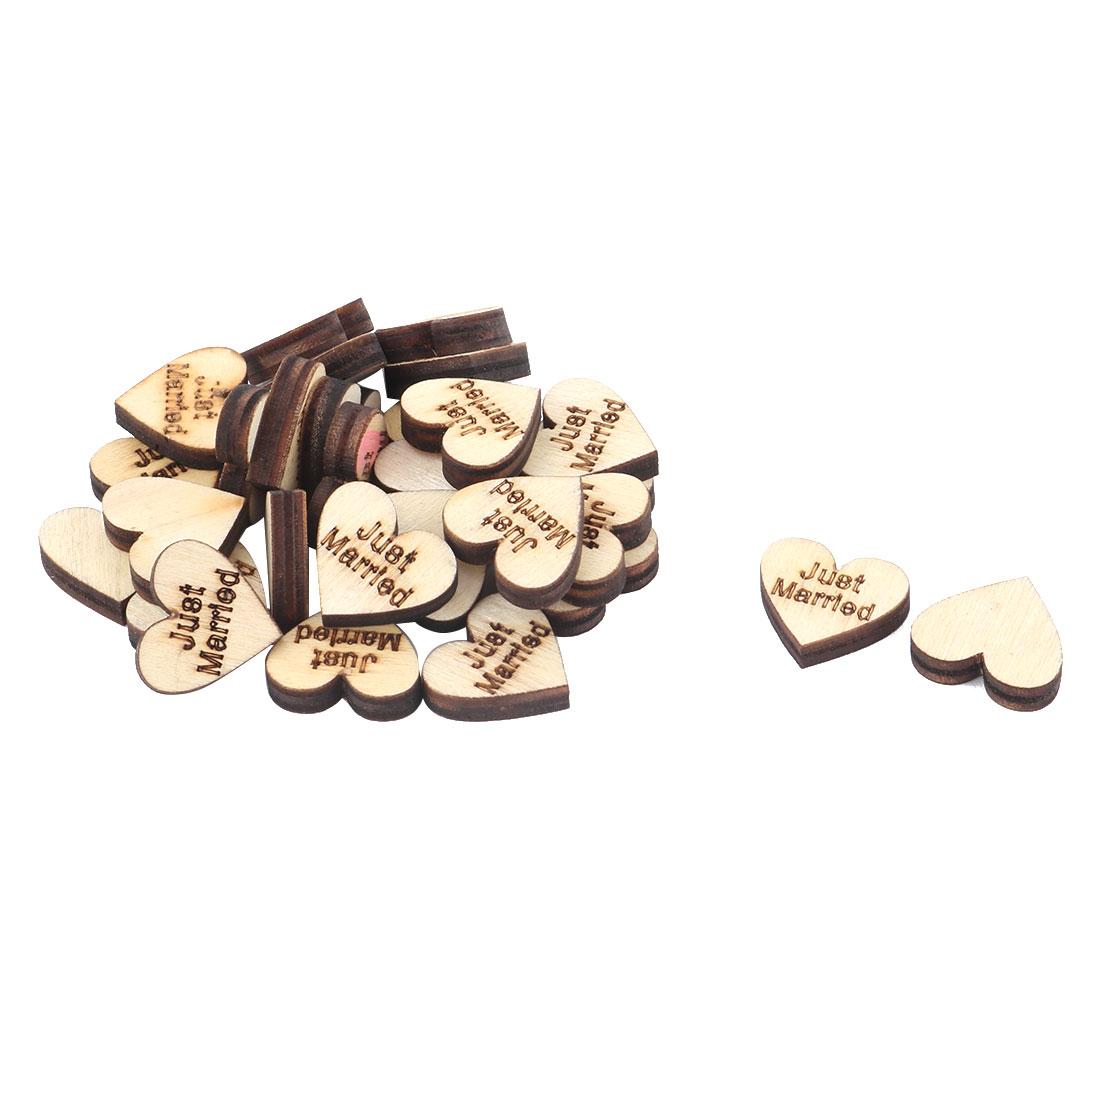 Wooden Slices Heart Shape DIY Crafts Wedding Table Decor Accessories Embellishment 30 Pcs